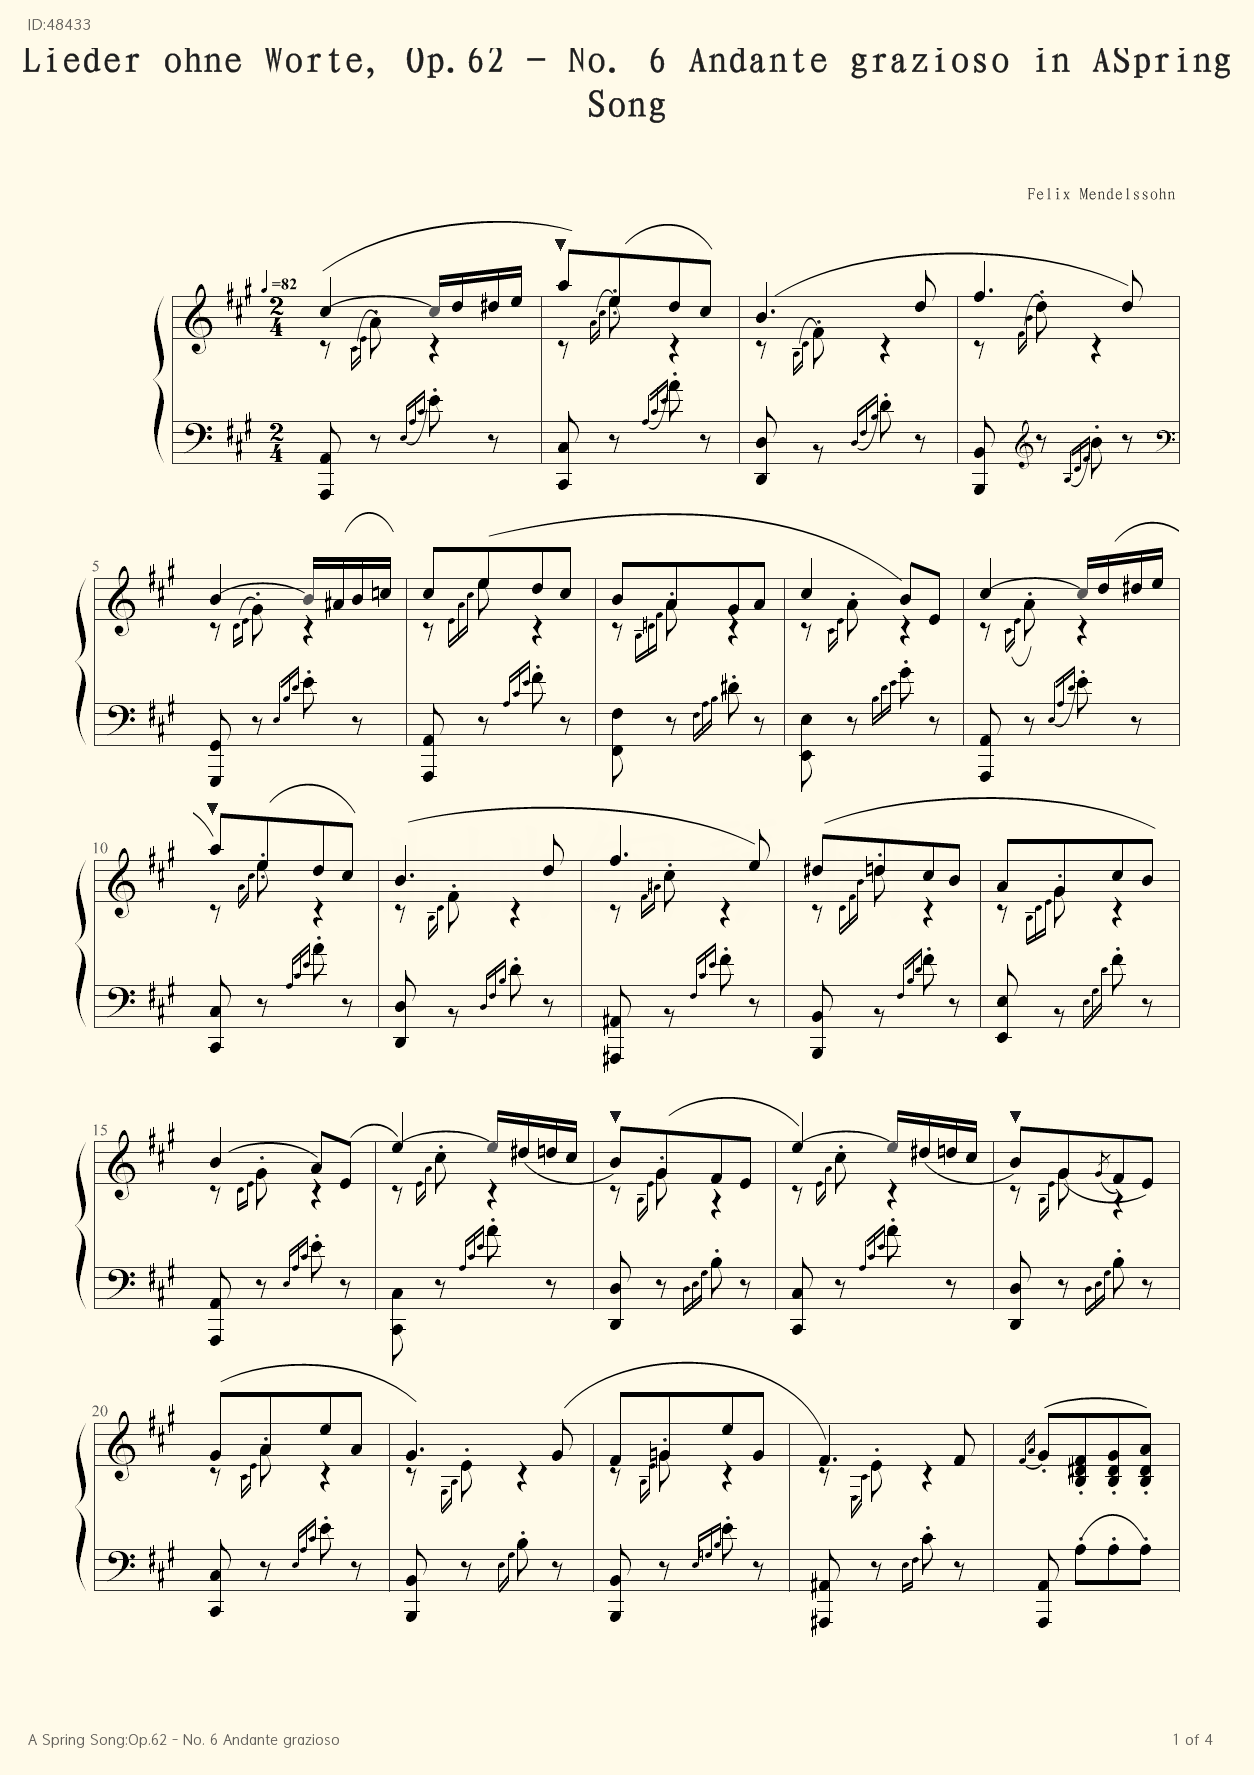 A Spring Song:Op.62 - No. 6 Andante grazioso  - Felix Mendelssohn - first page